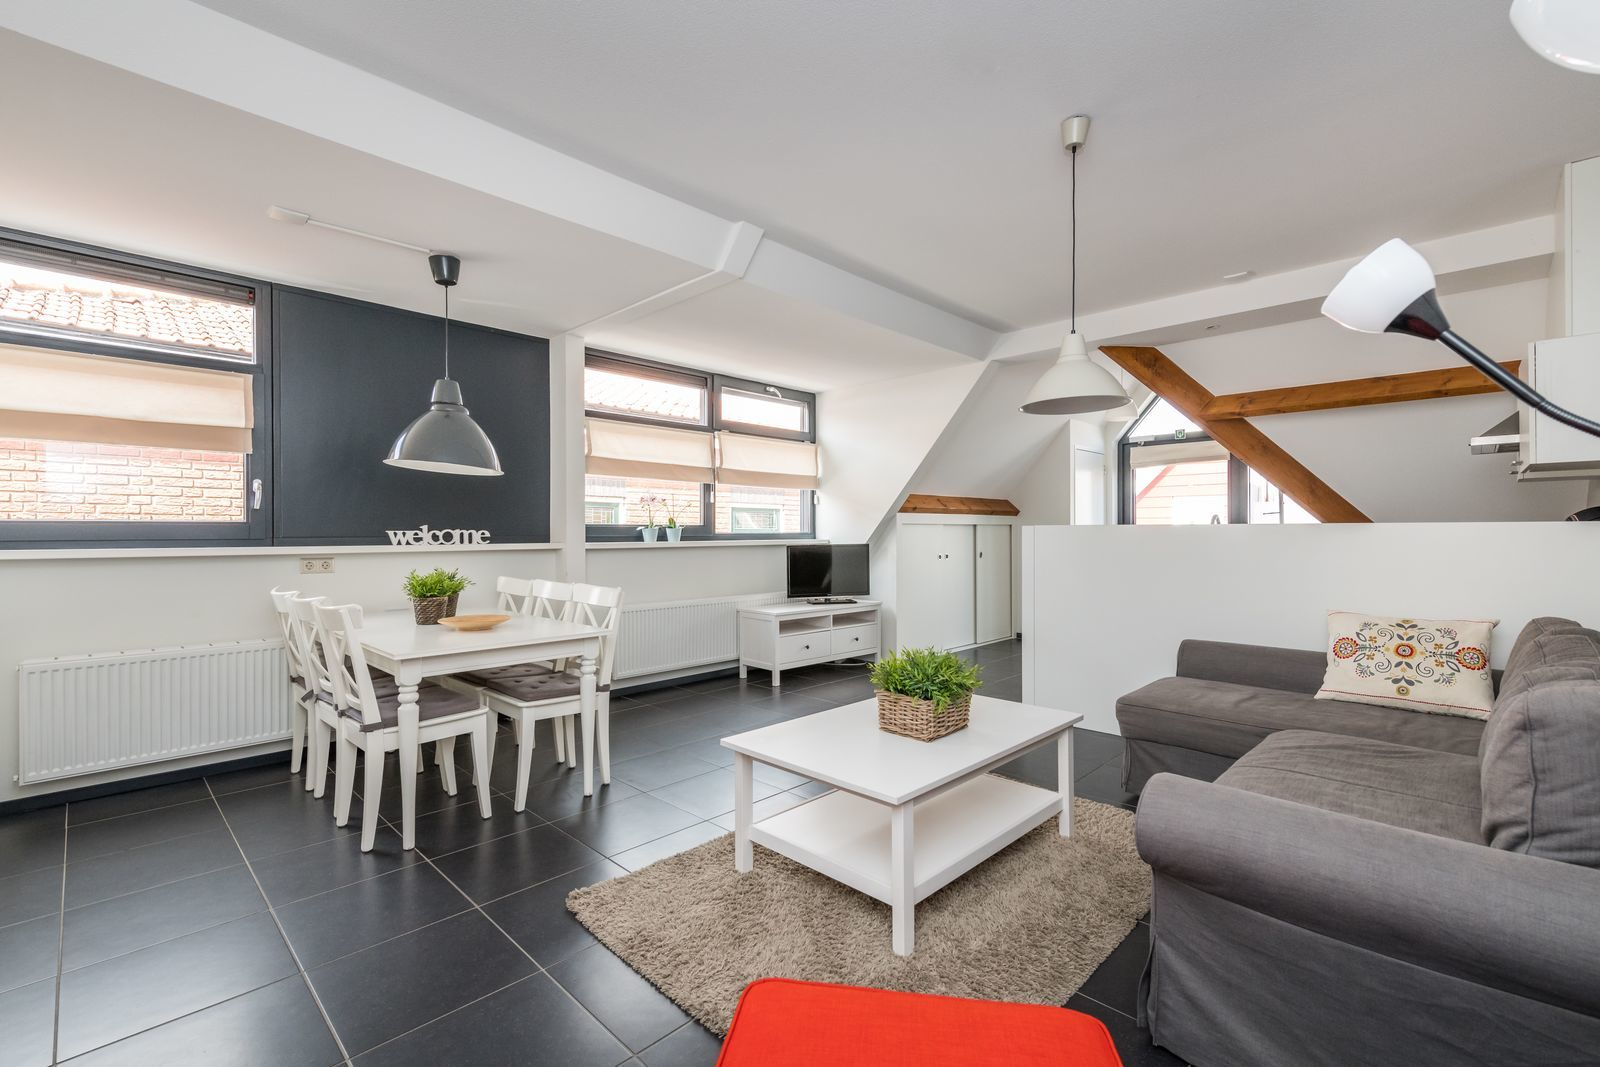 Appartement Noord (6 personen) - Ouddorp